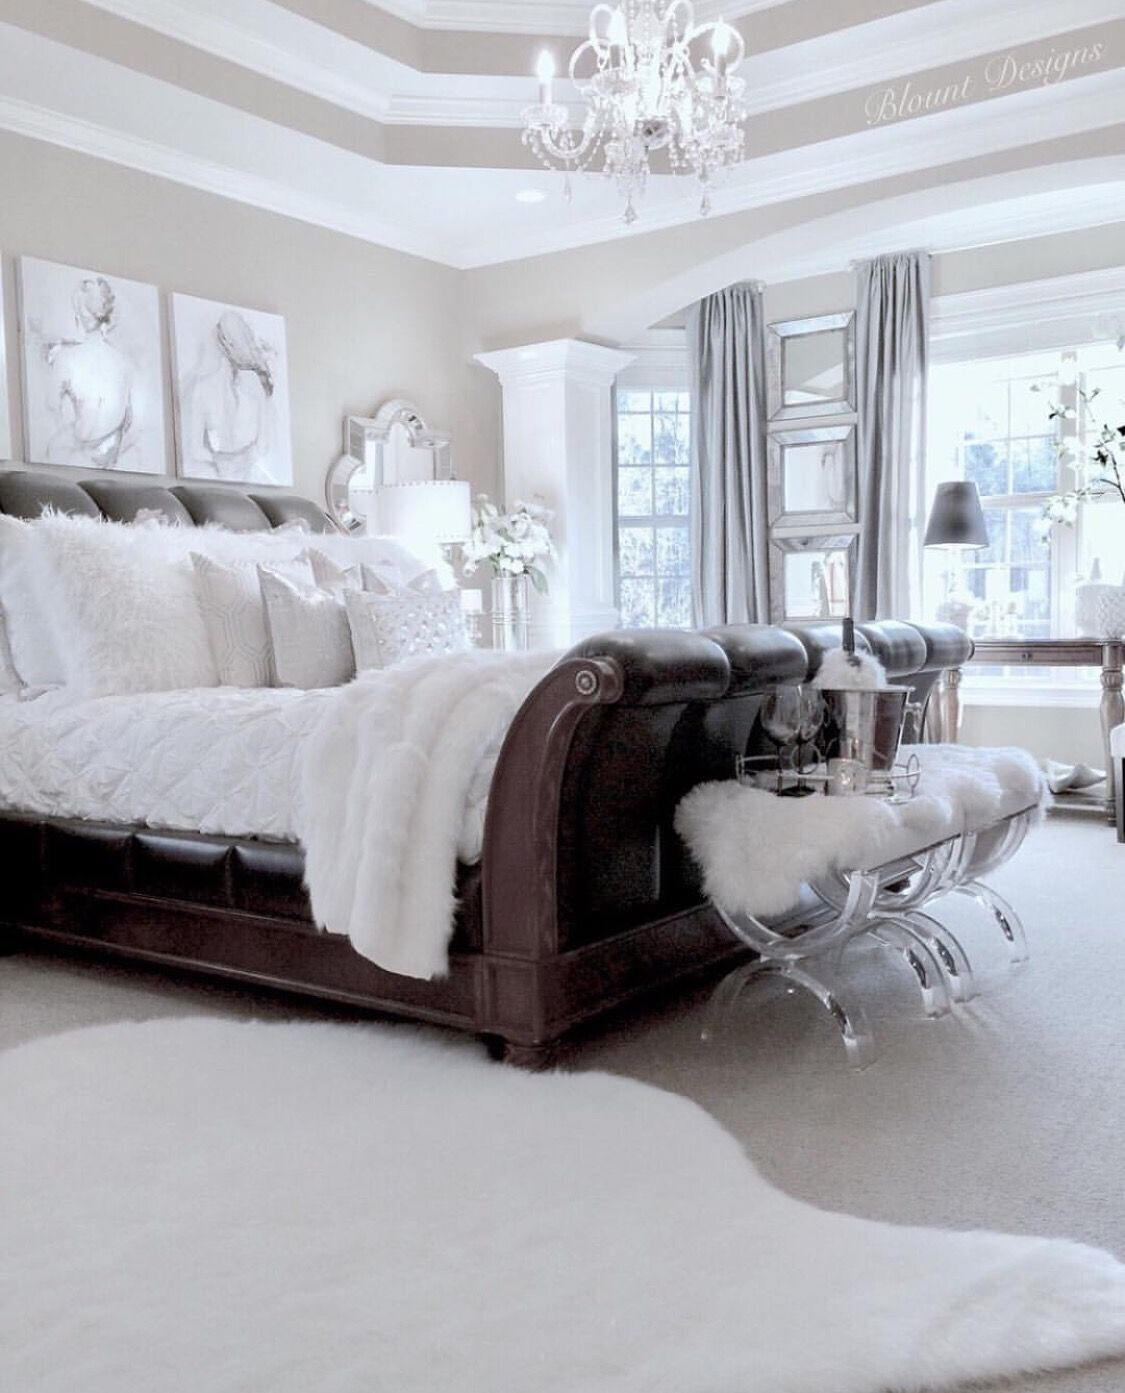 Bright White Home Of Deborah Blount Luxury Bedroom Master Luxurious Bedrooms Elegant Bedroom